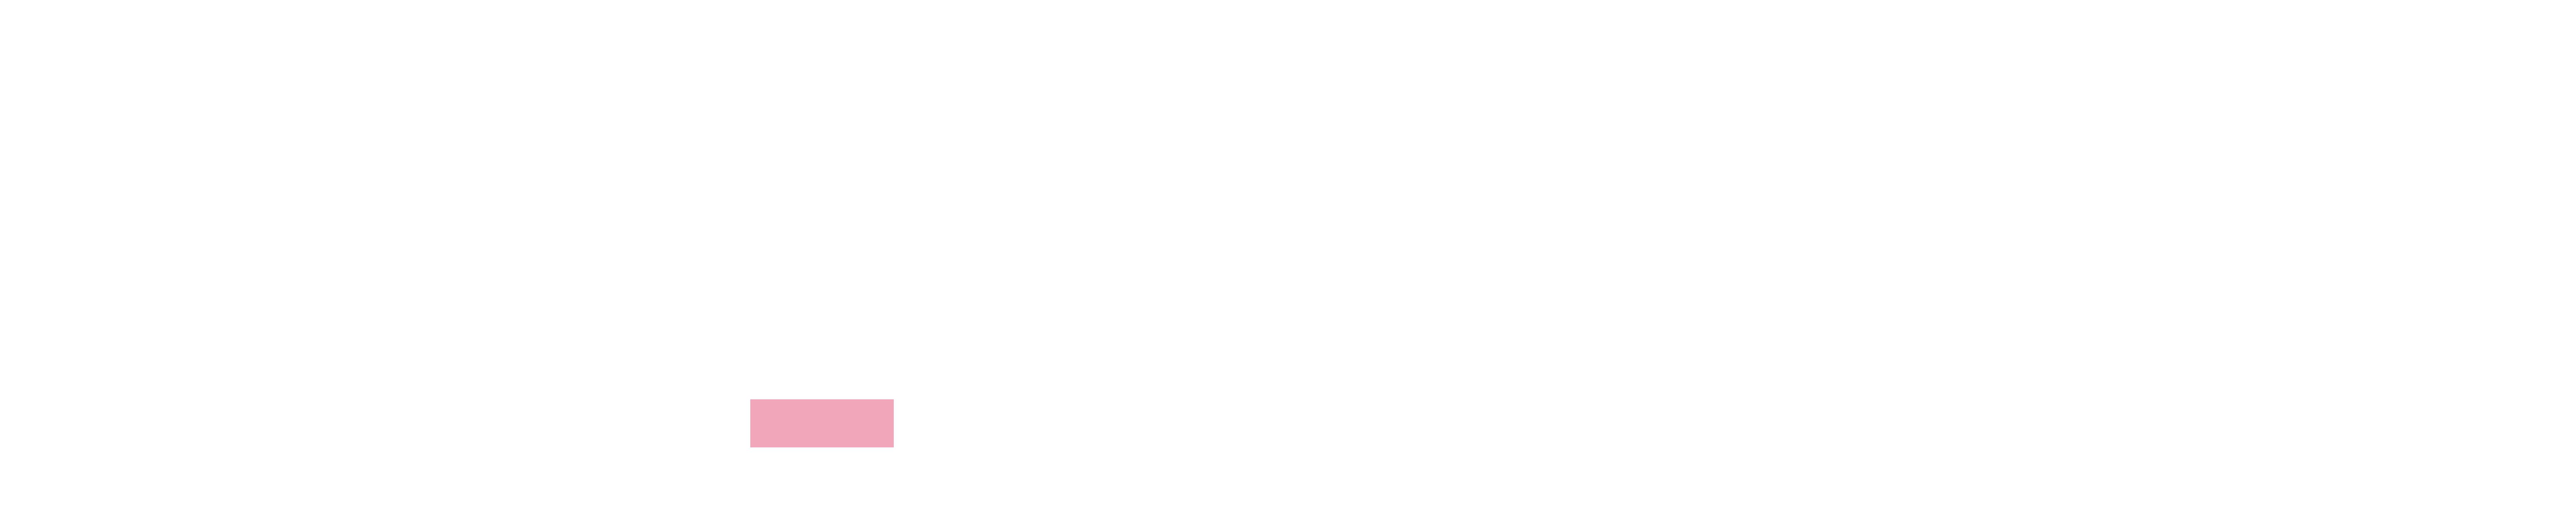 AstPro Media Group